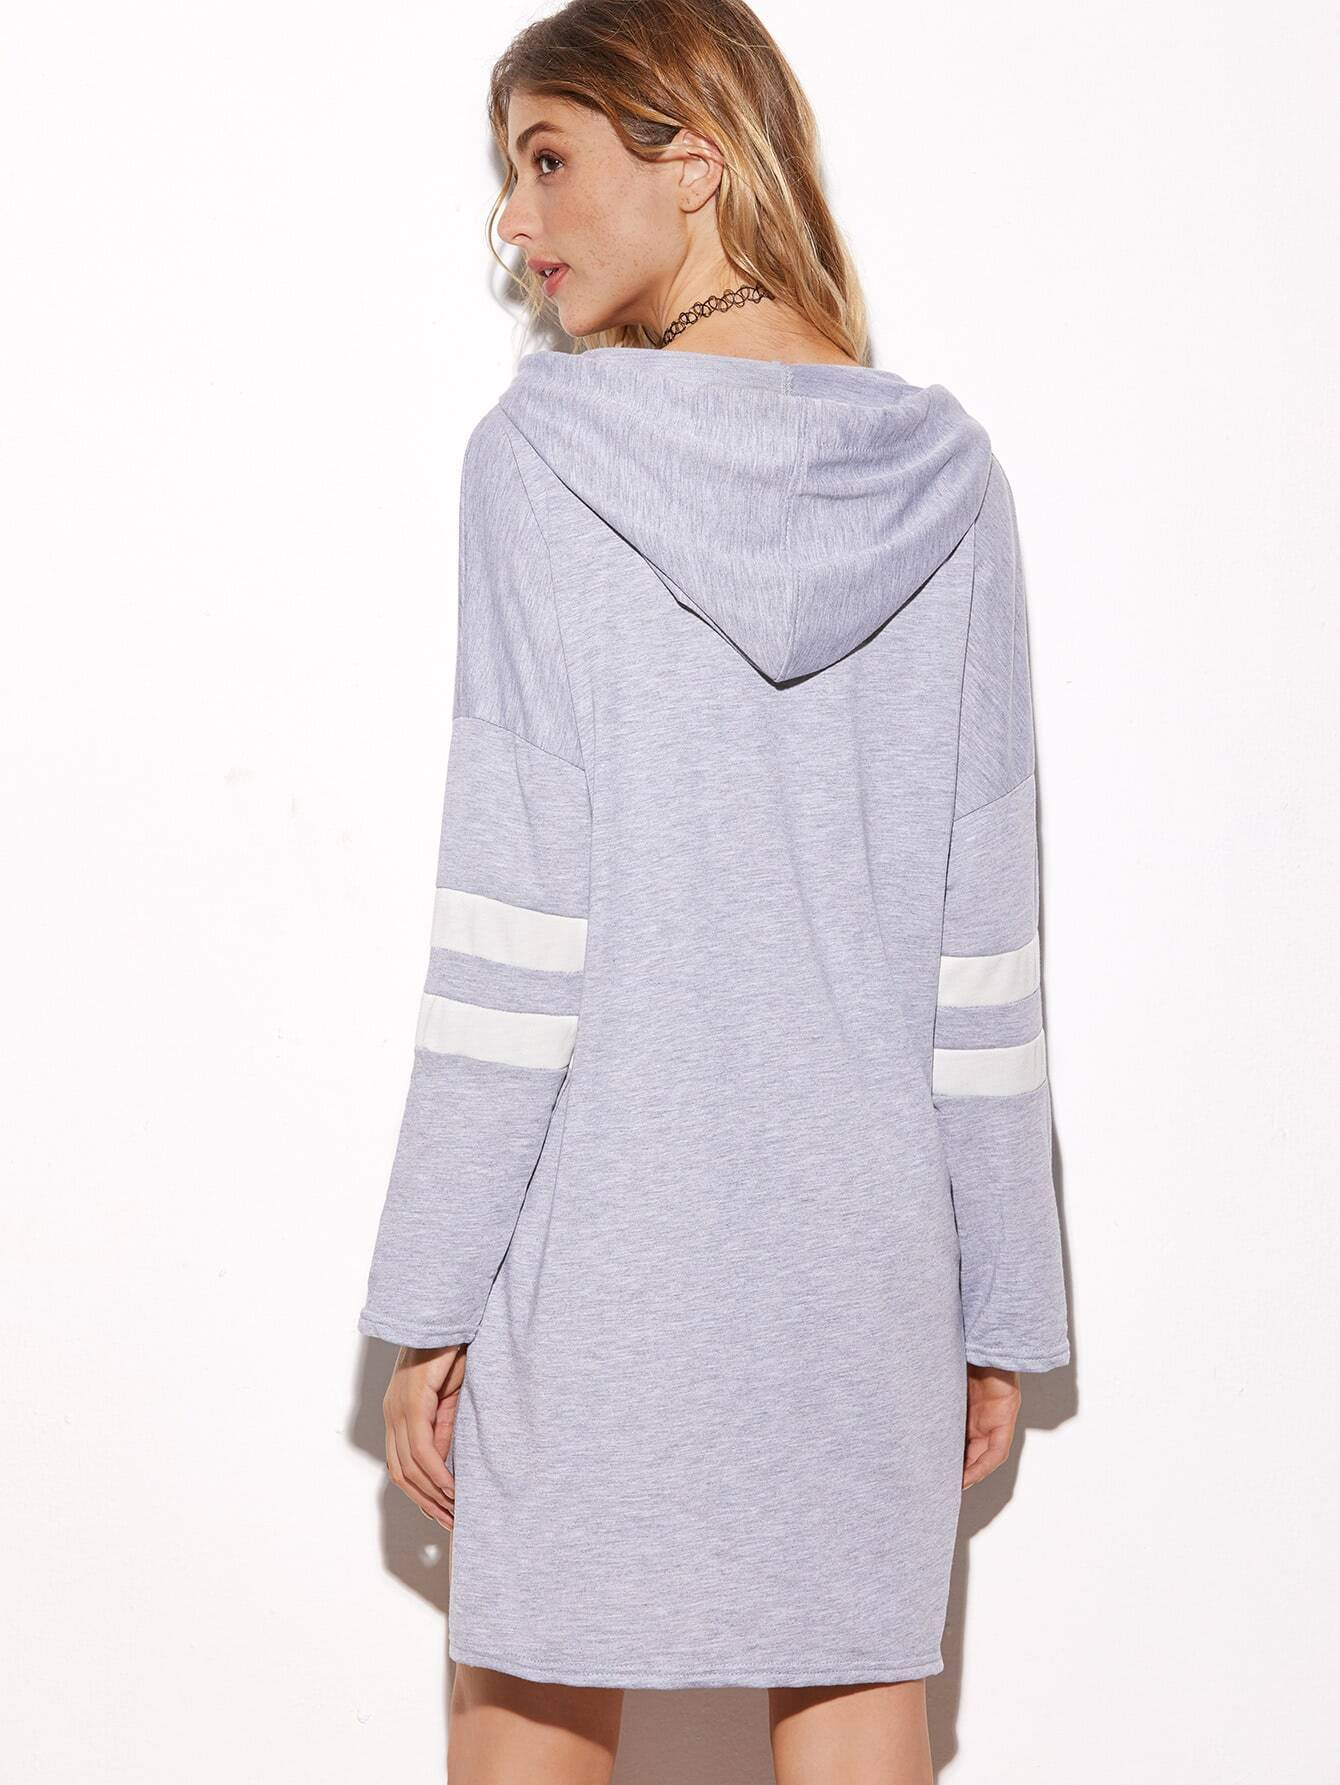 Sweatshirt kleid mit kapuzen stickereien gestreifte rmel for Sweatshirt kleid lang